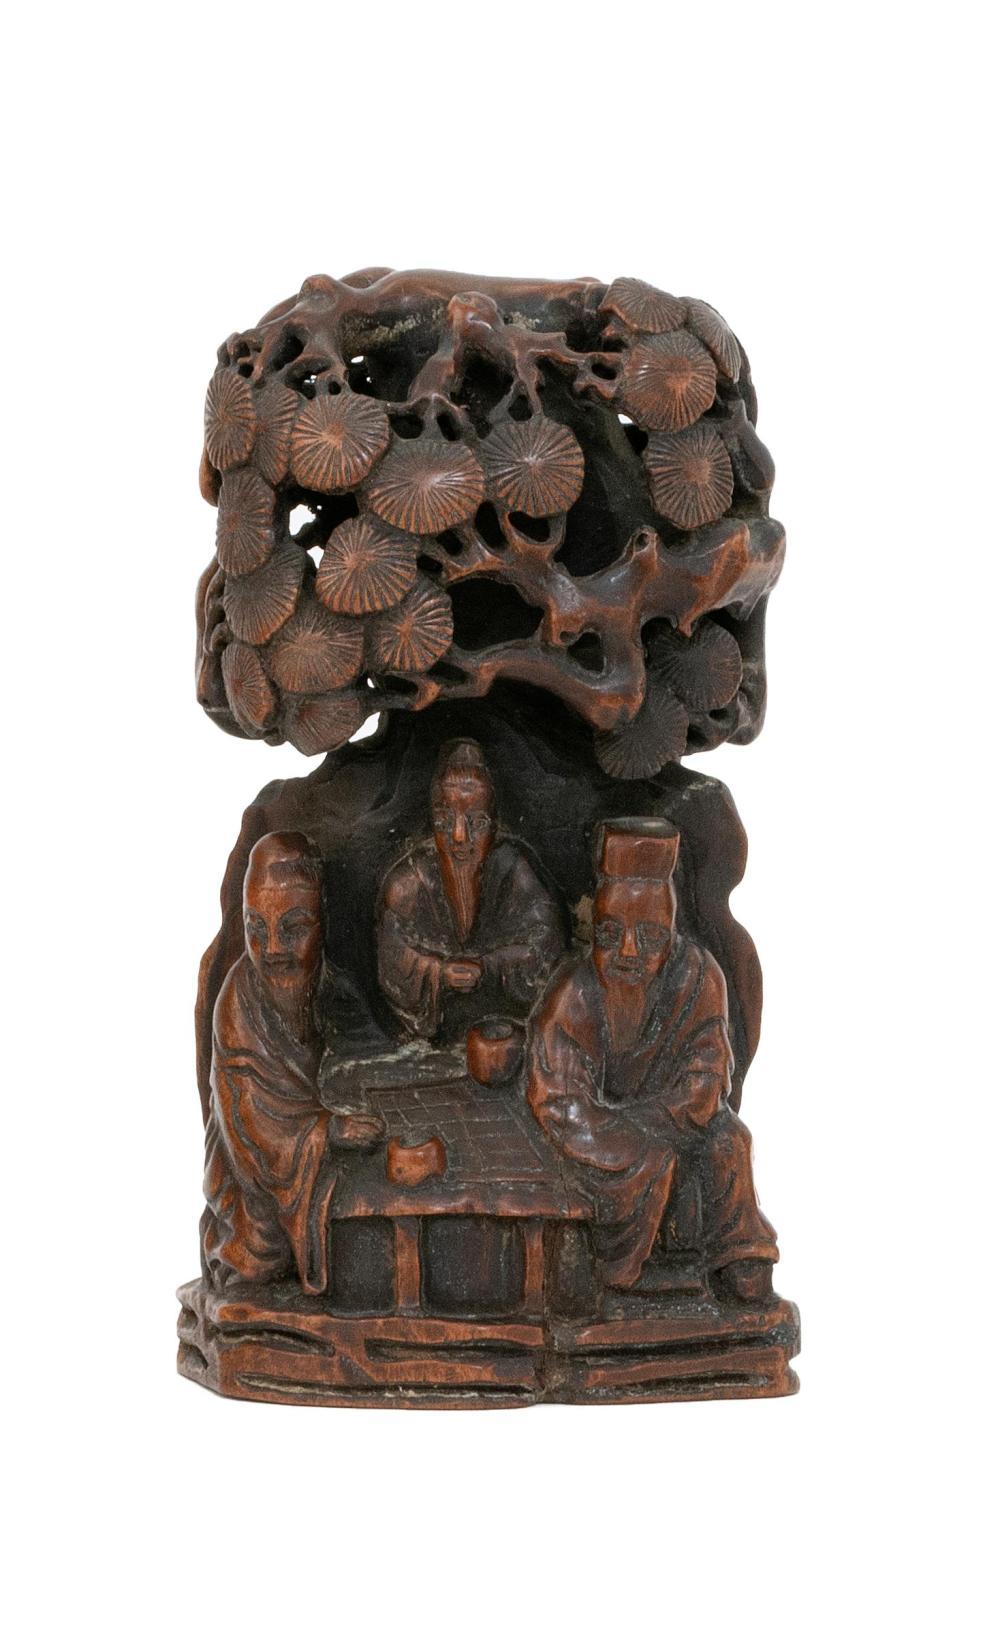 Boxwood carving sale number lot number skinner